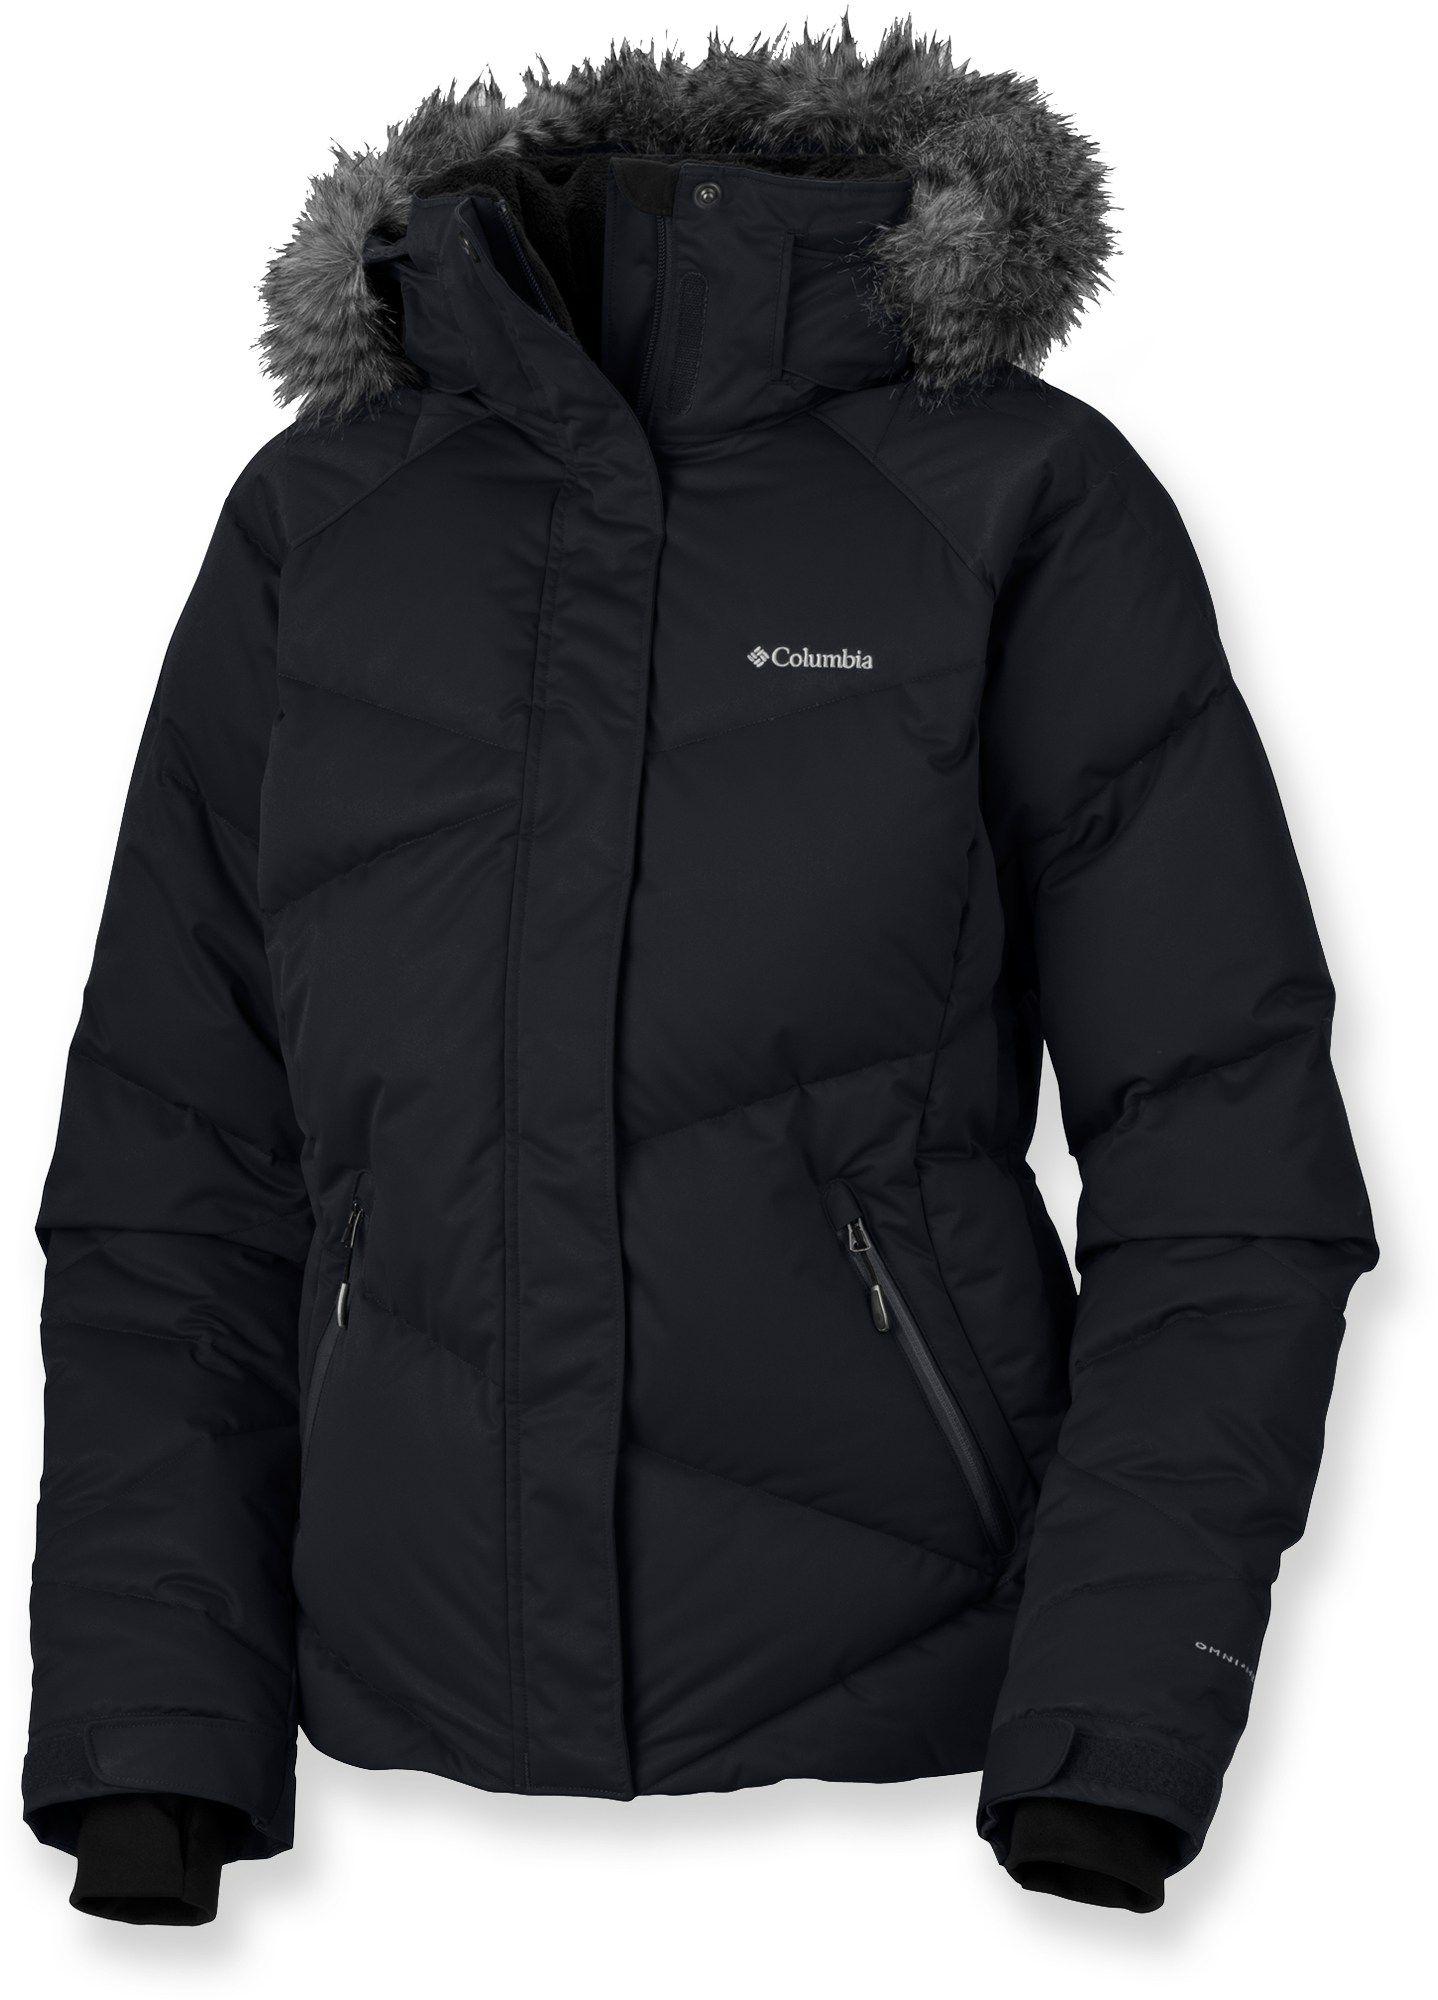 Columbia Lay D Down Jacket Women's Plus Sizes Jackets